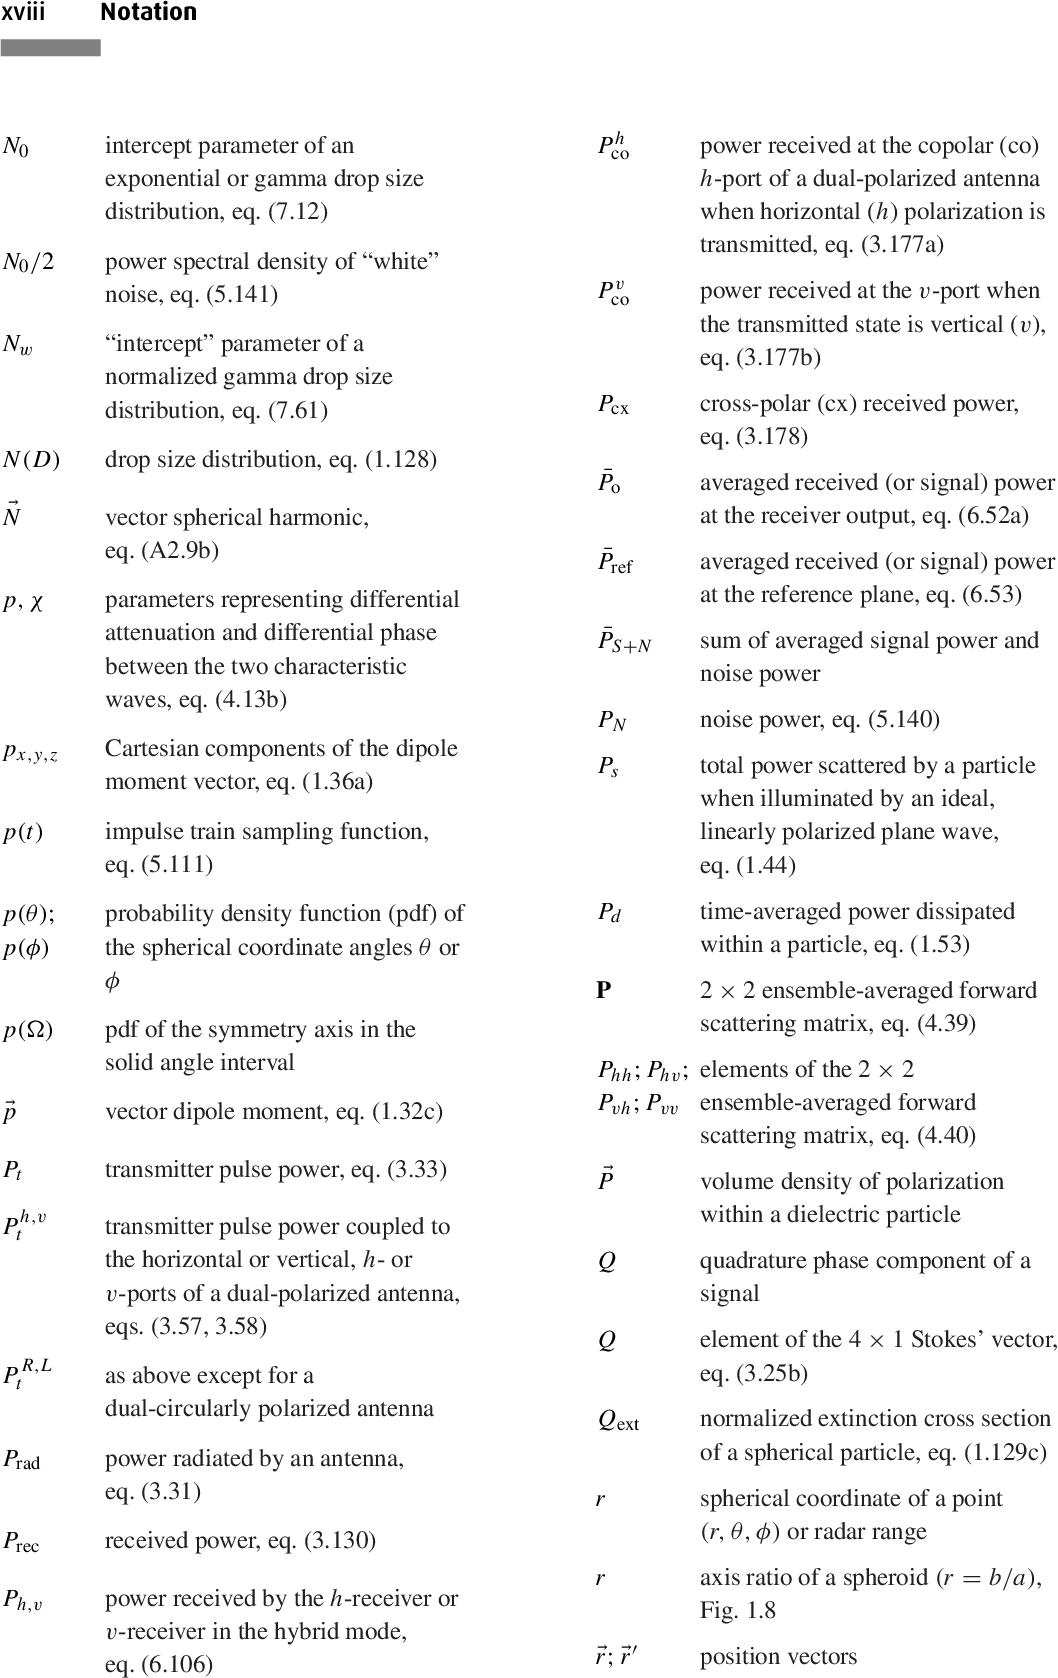 PDF] Polarimetric Doppler Weather Radar: Principles and